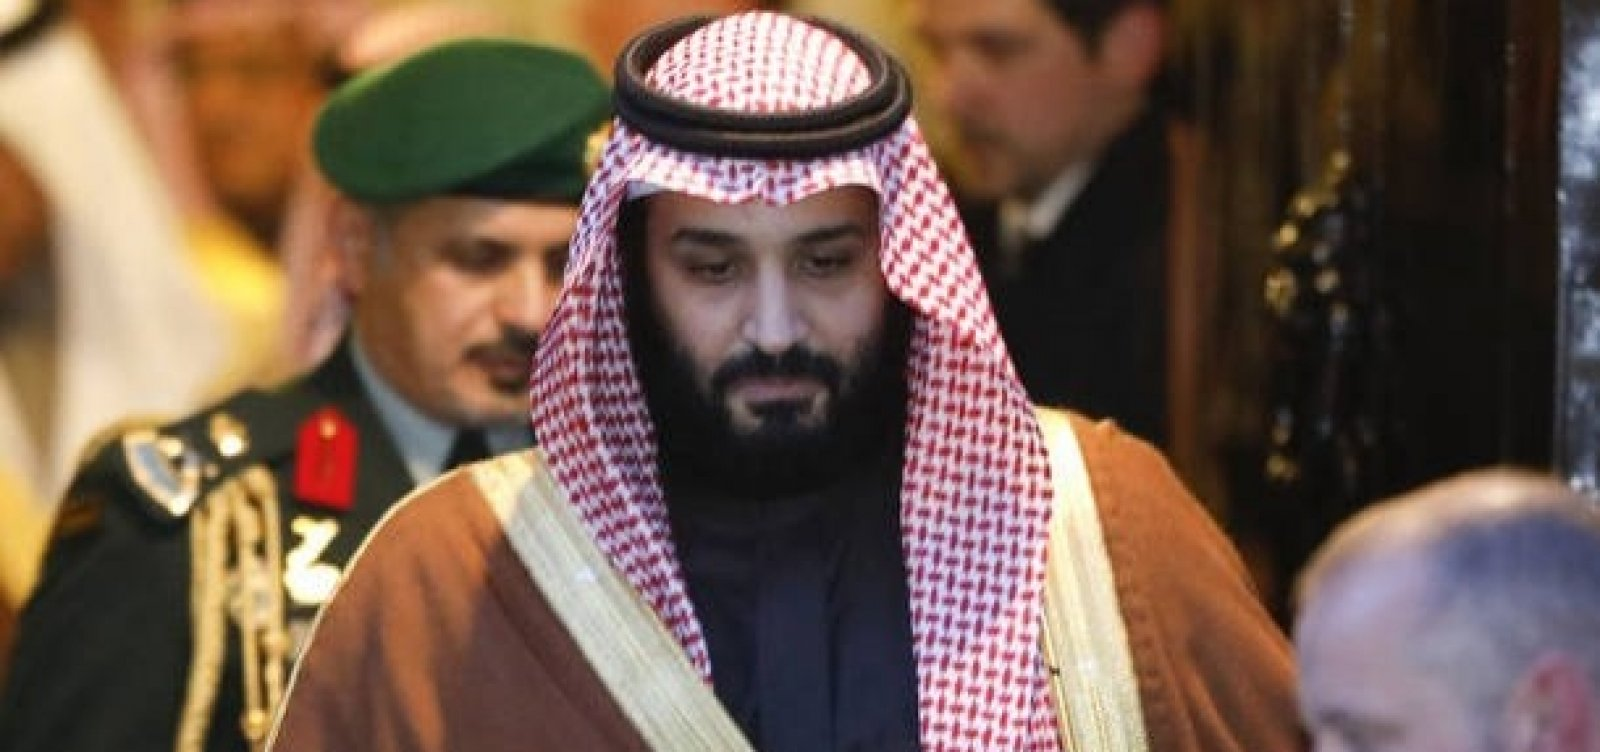 [Príncipe da Arábia Saudita disse a Trump que jornalista assassinado era 'islamista perigoso']